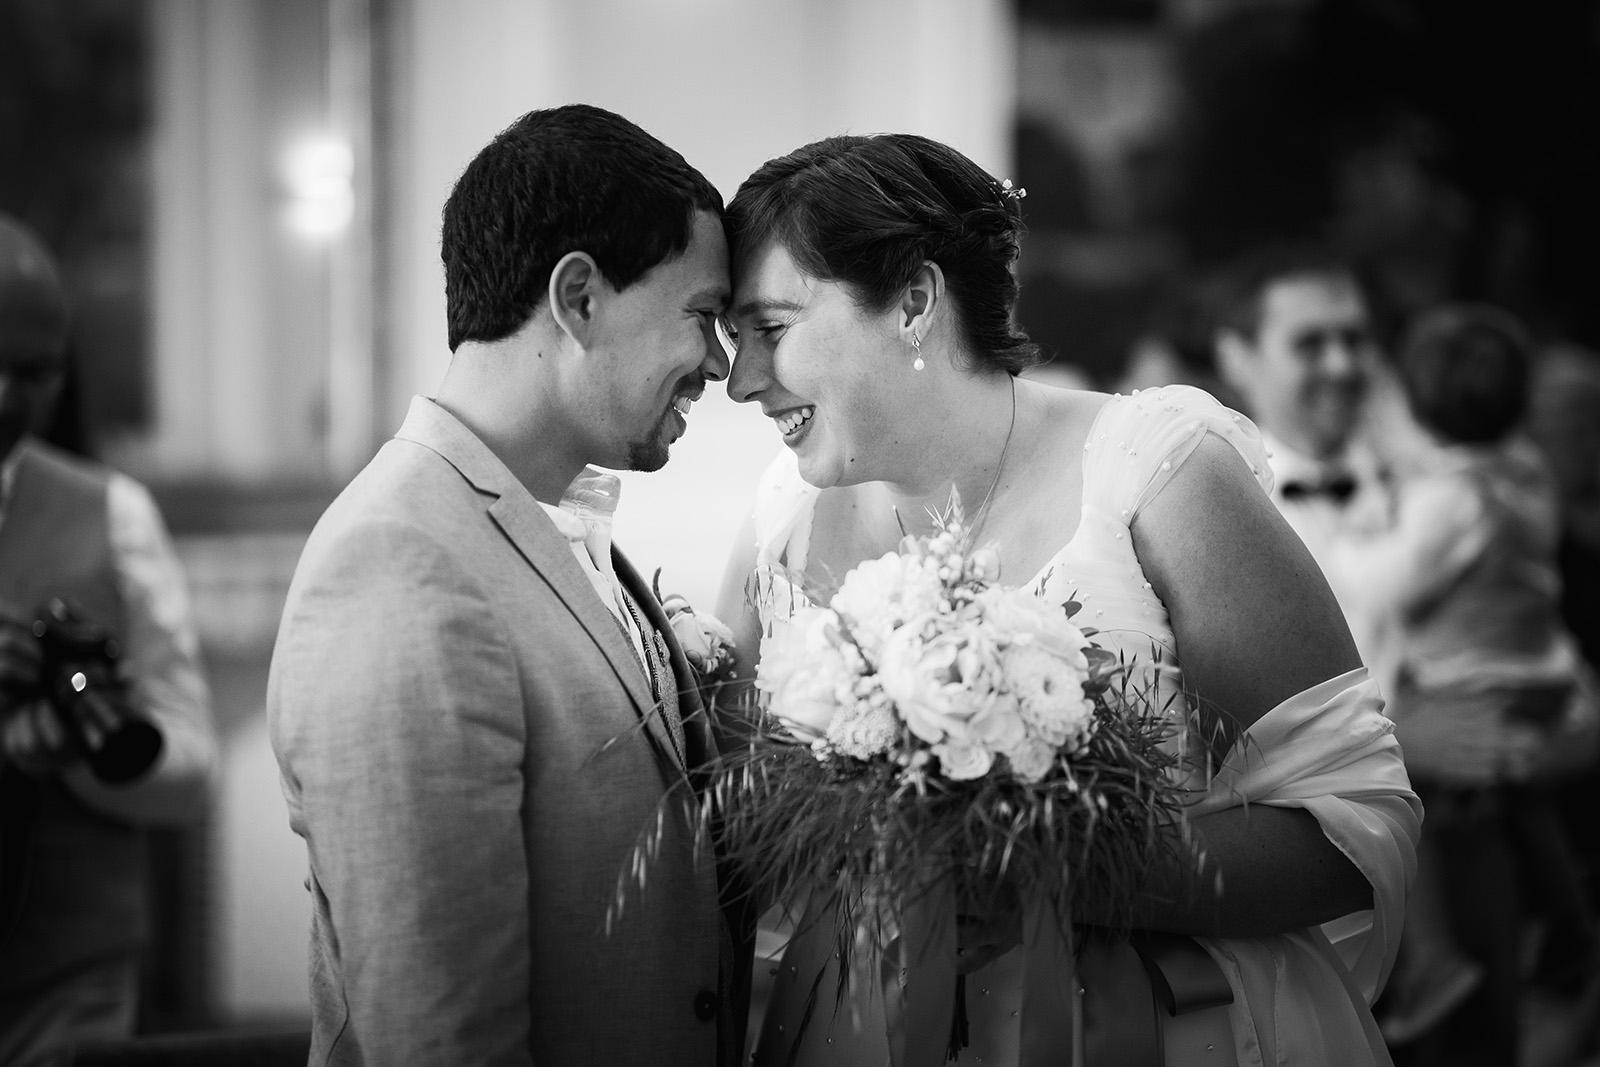 mariage-wedding-reportage-ceremonie-vaison-la-romaine-provence-alpes-cote-dazur-vaucluse-elise-julliard-photographe-6